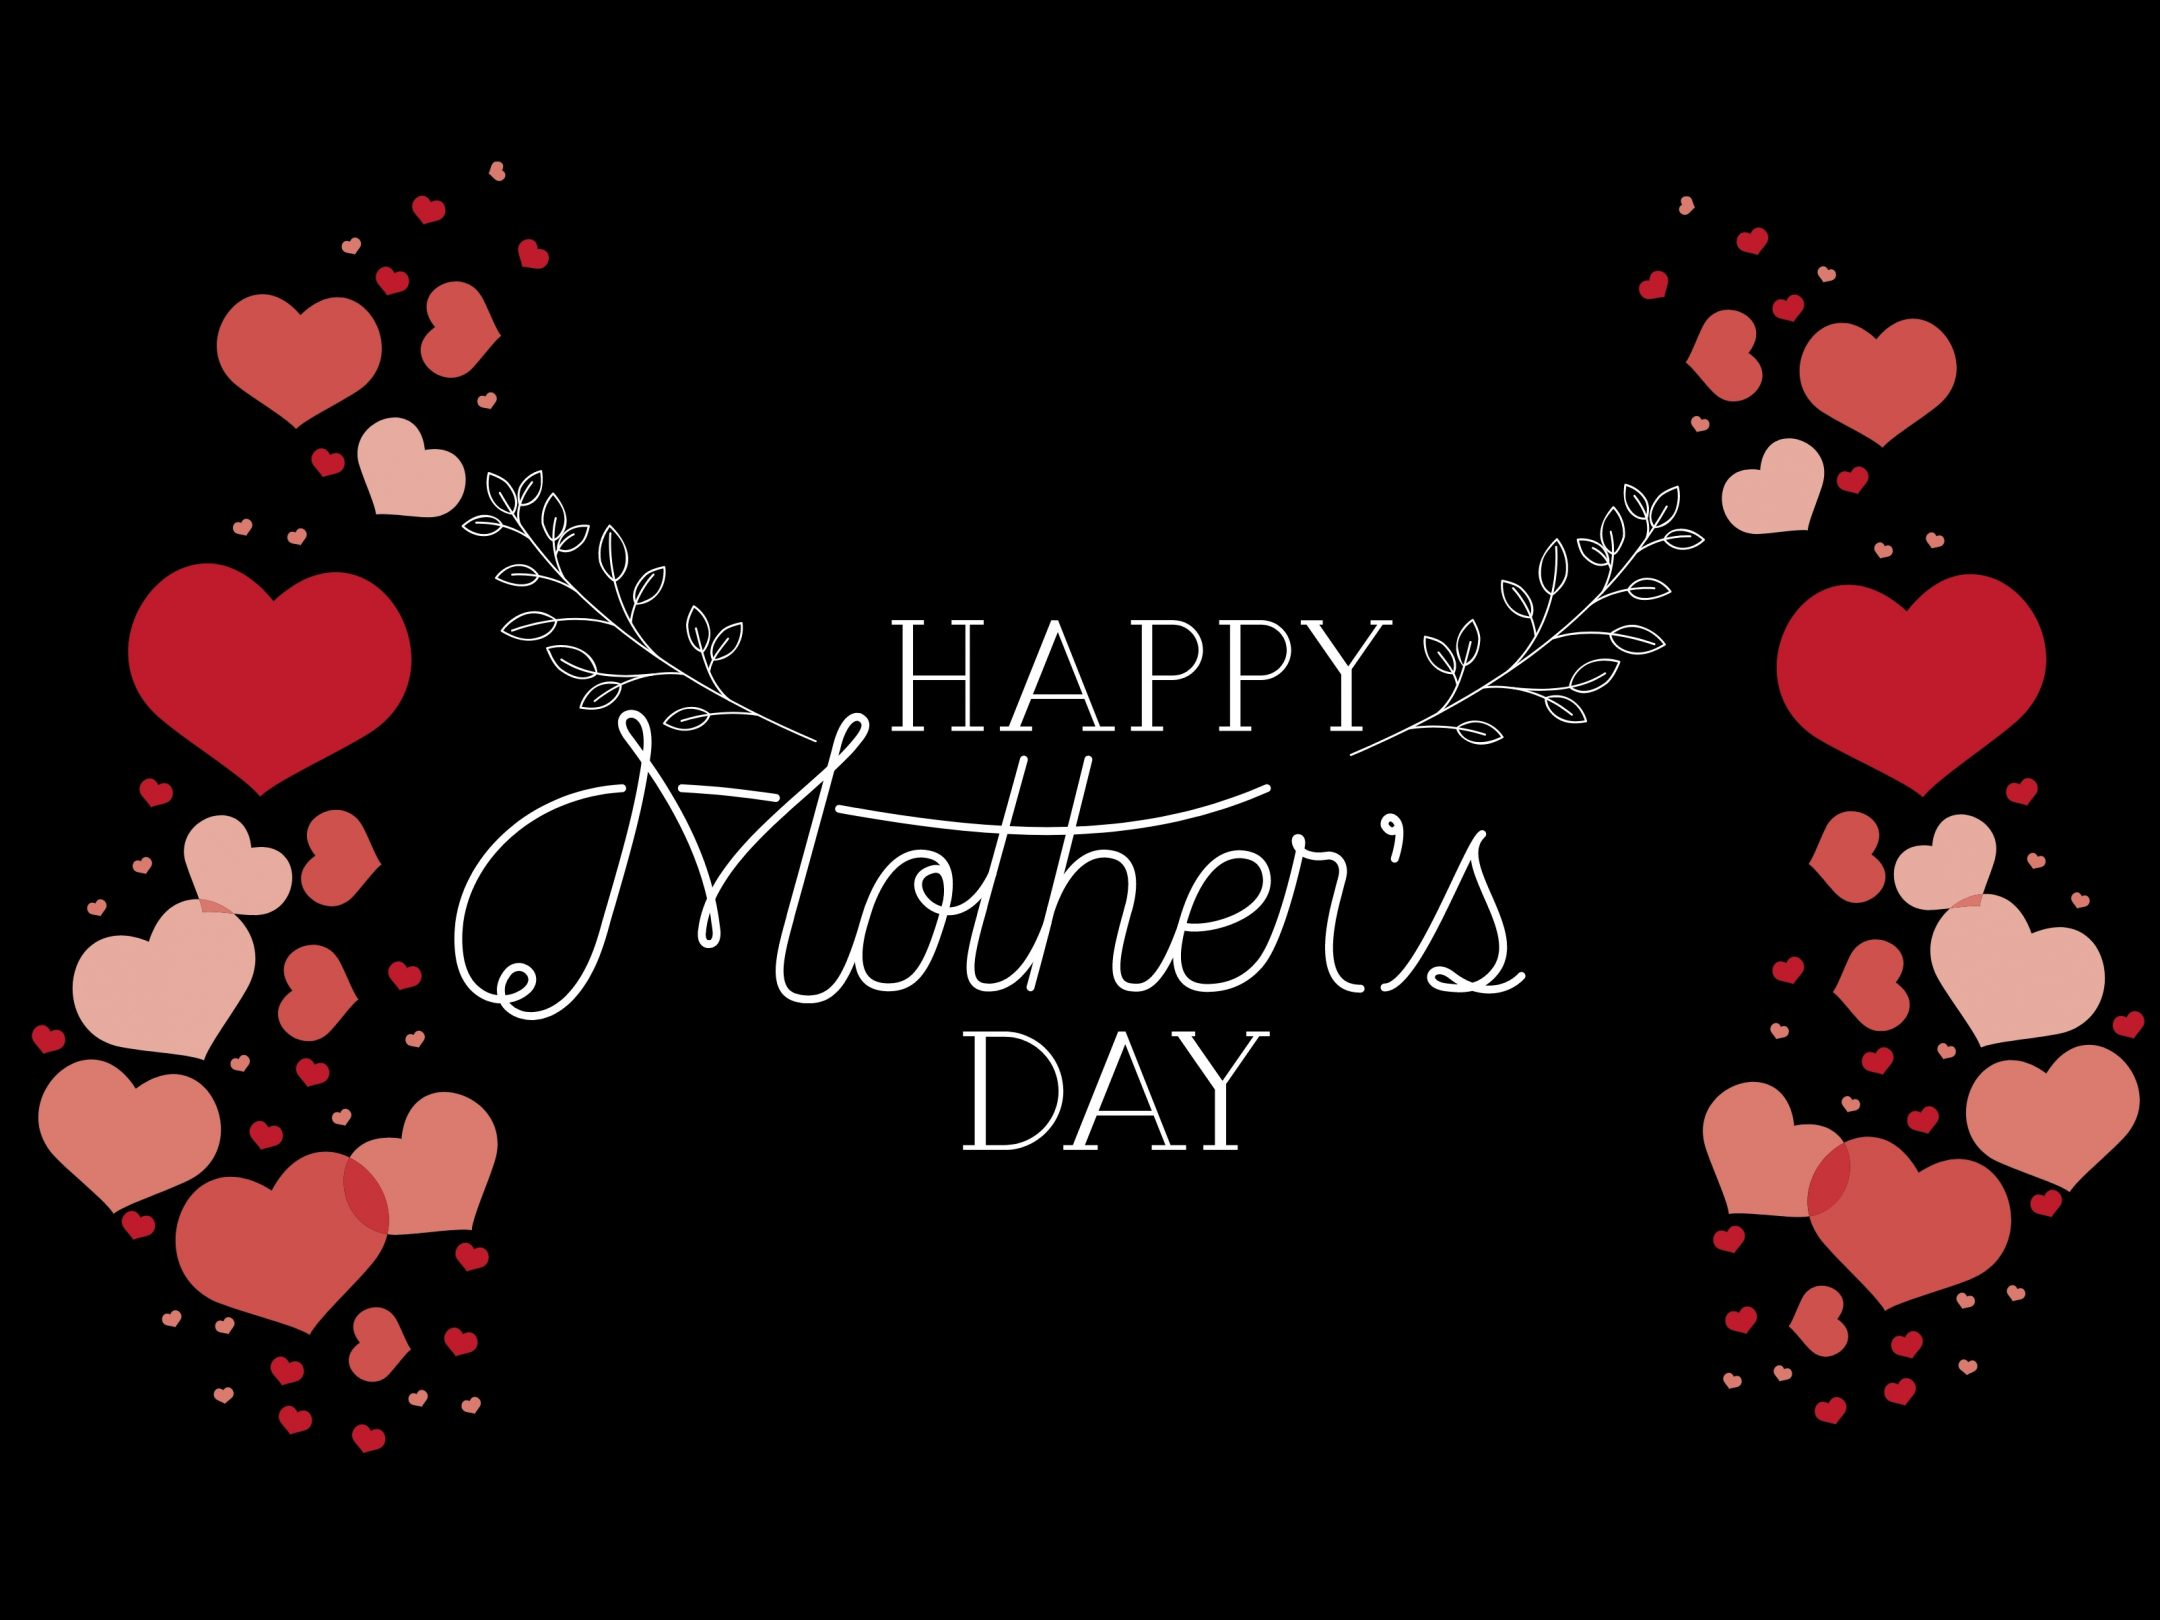 2160x1620 iPad wallpaper 4k Happy Mothers Day iPad Wallpaper 2160x1620 pixels resolution